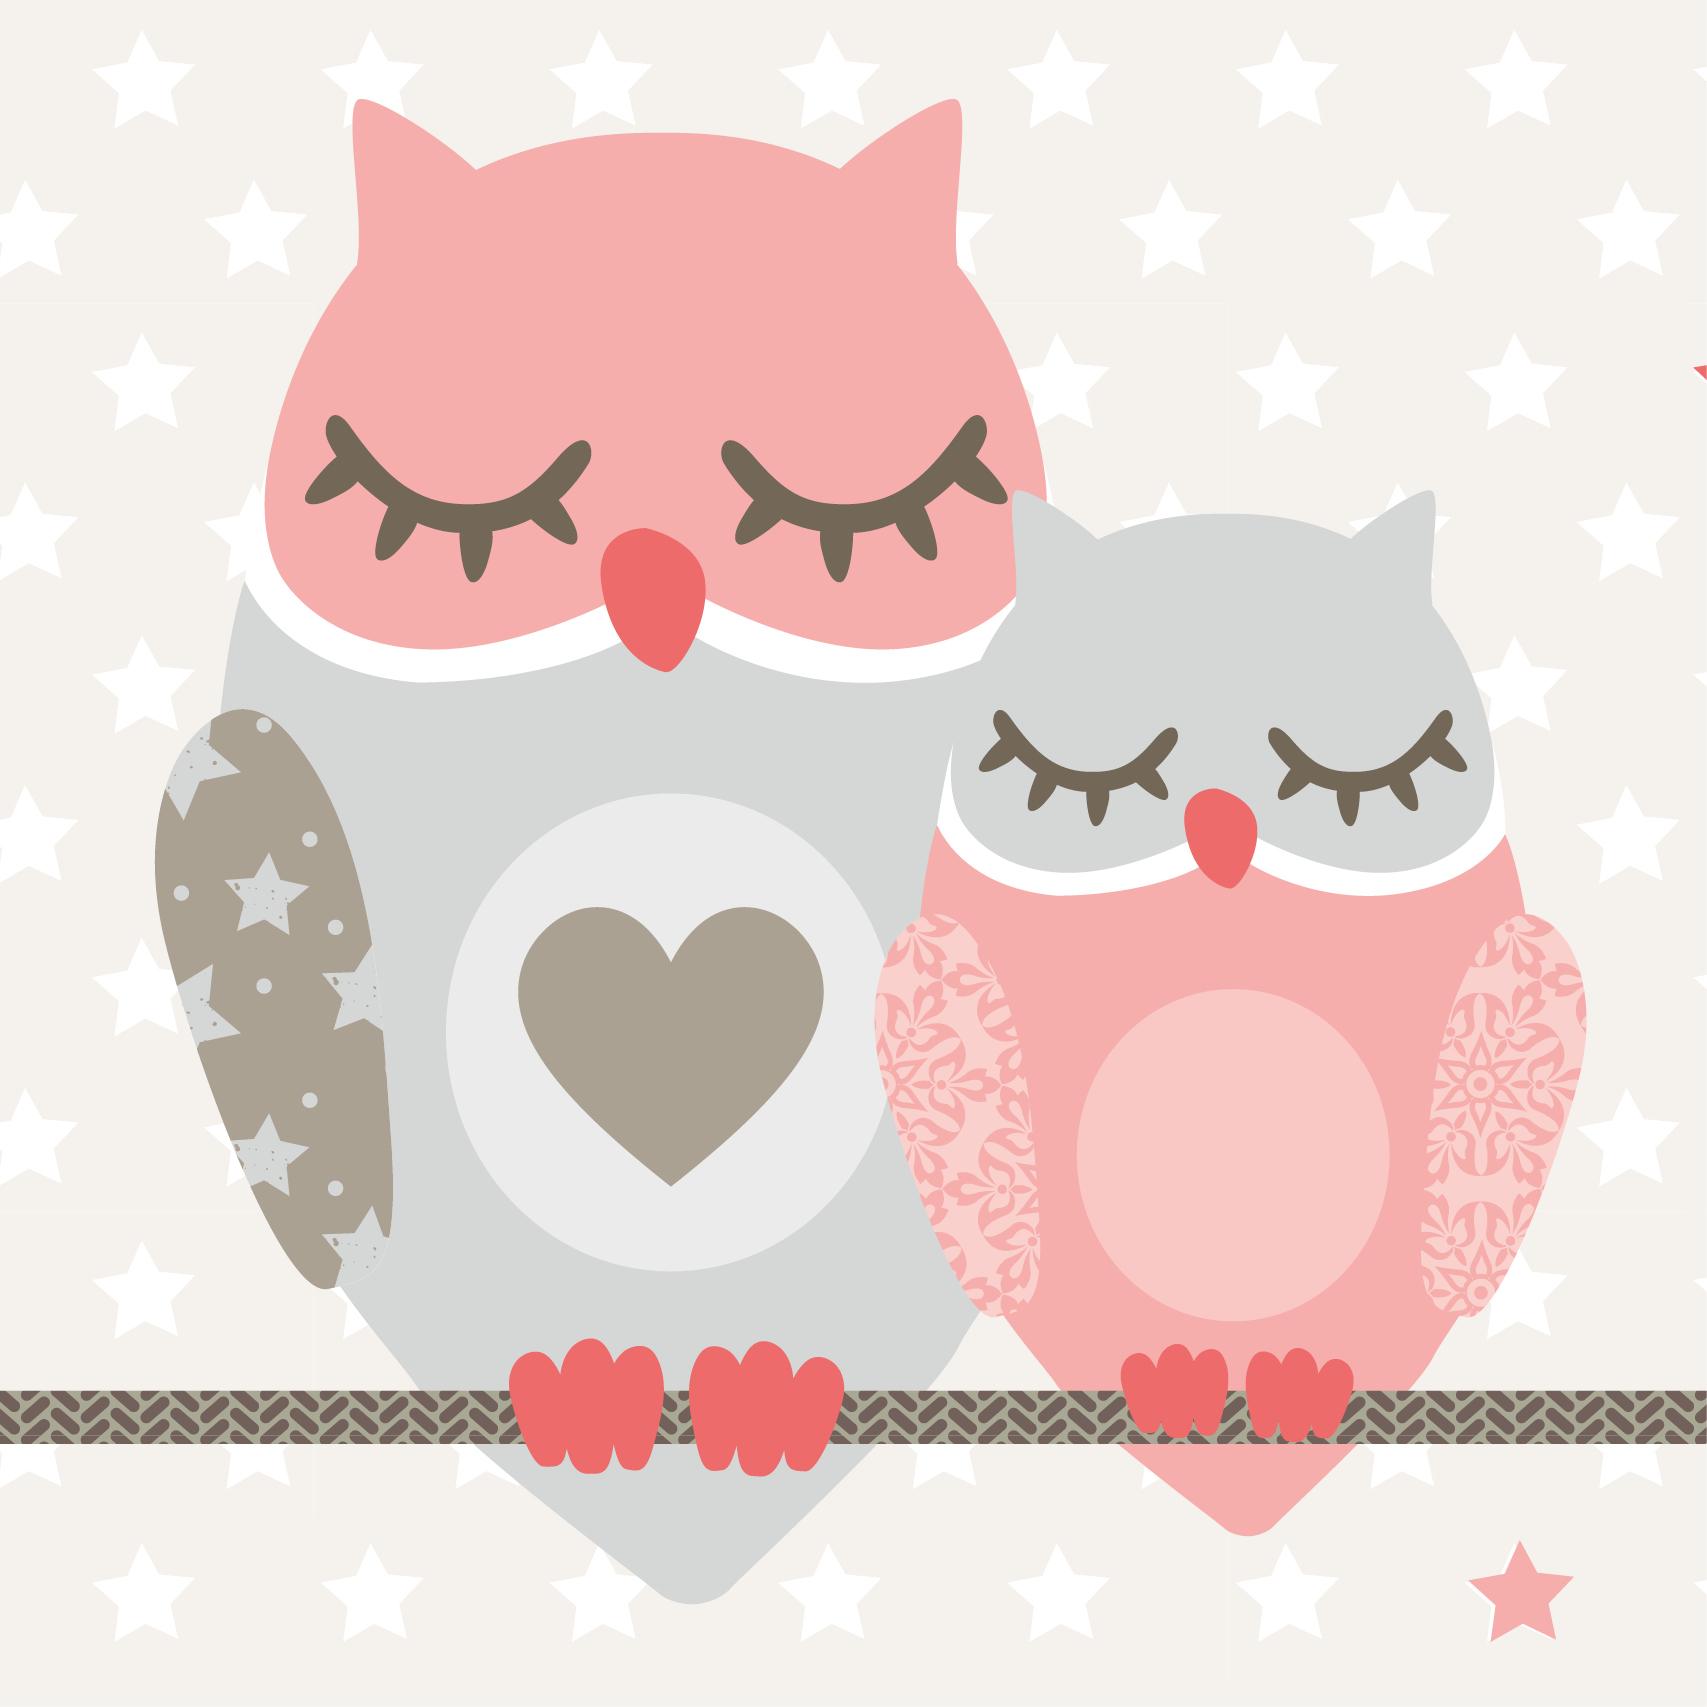 Selbstklebende Bordure Owl Stars Girls Apricot Taupe Borduren